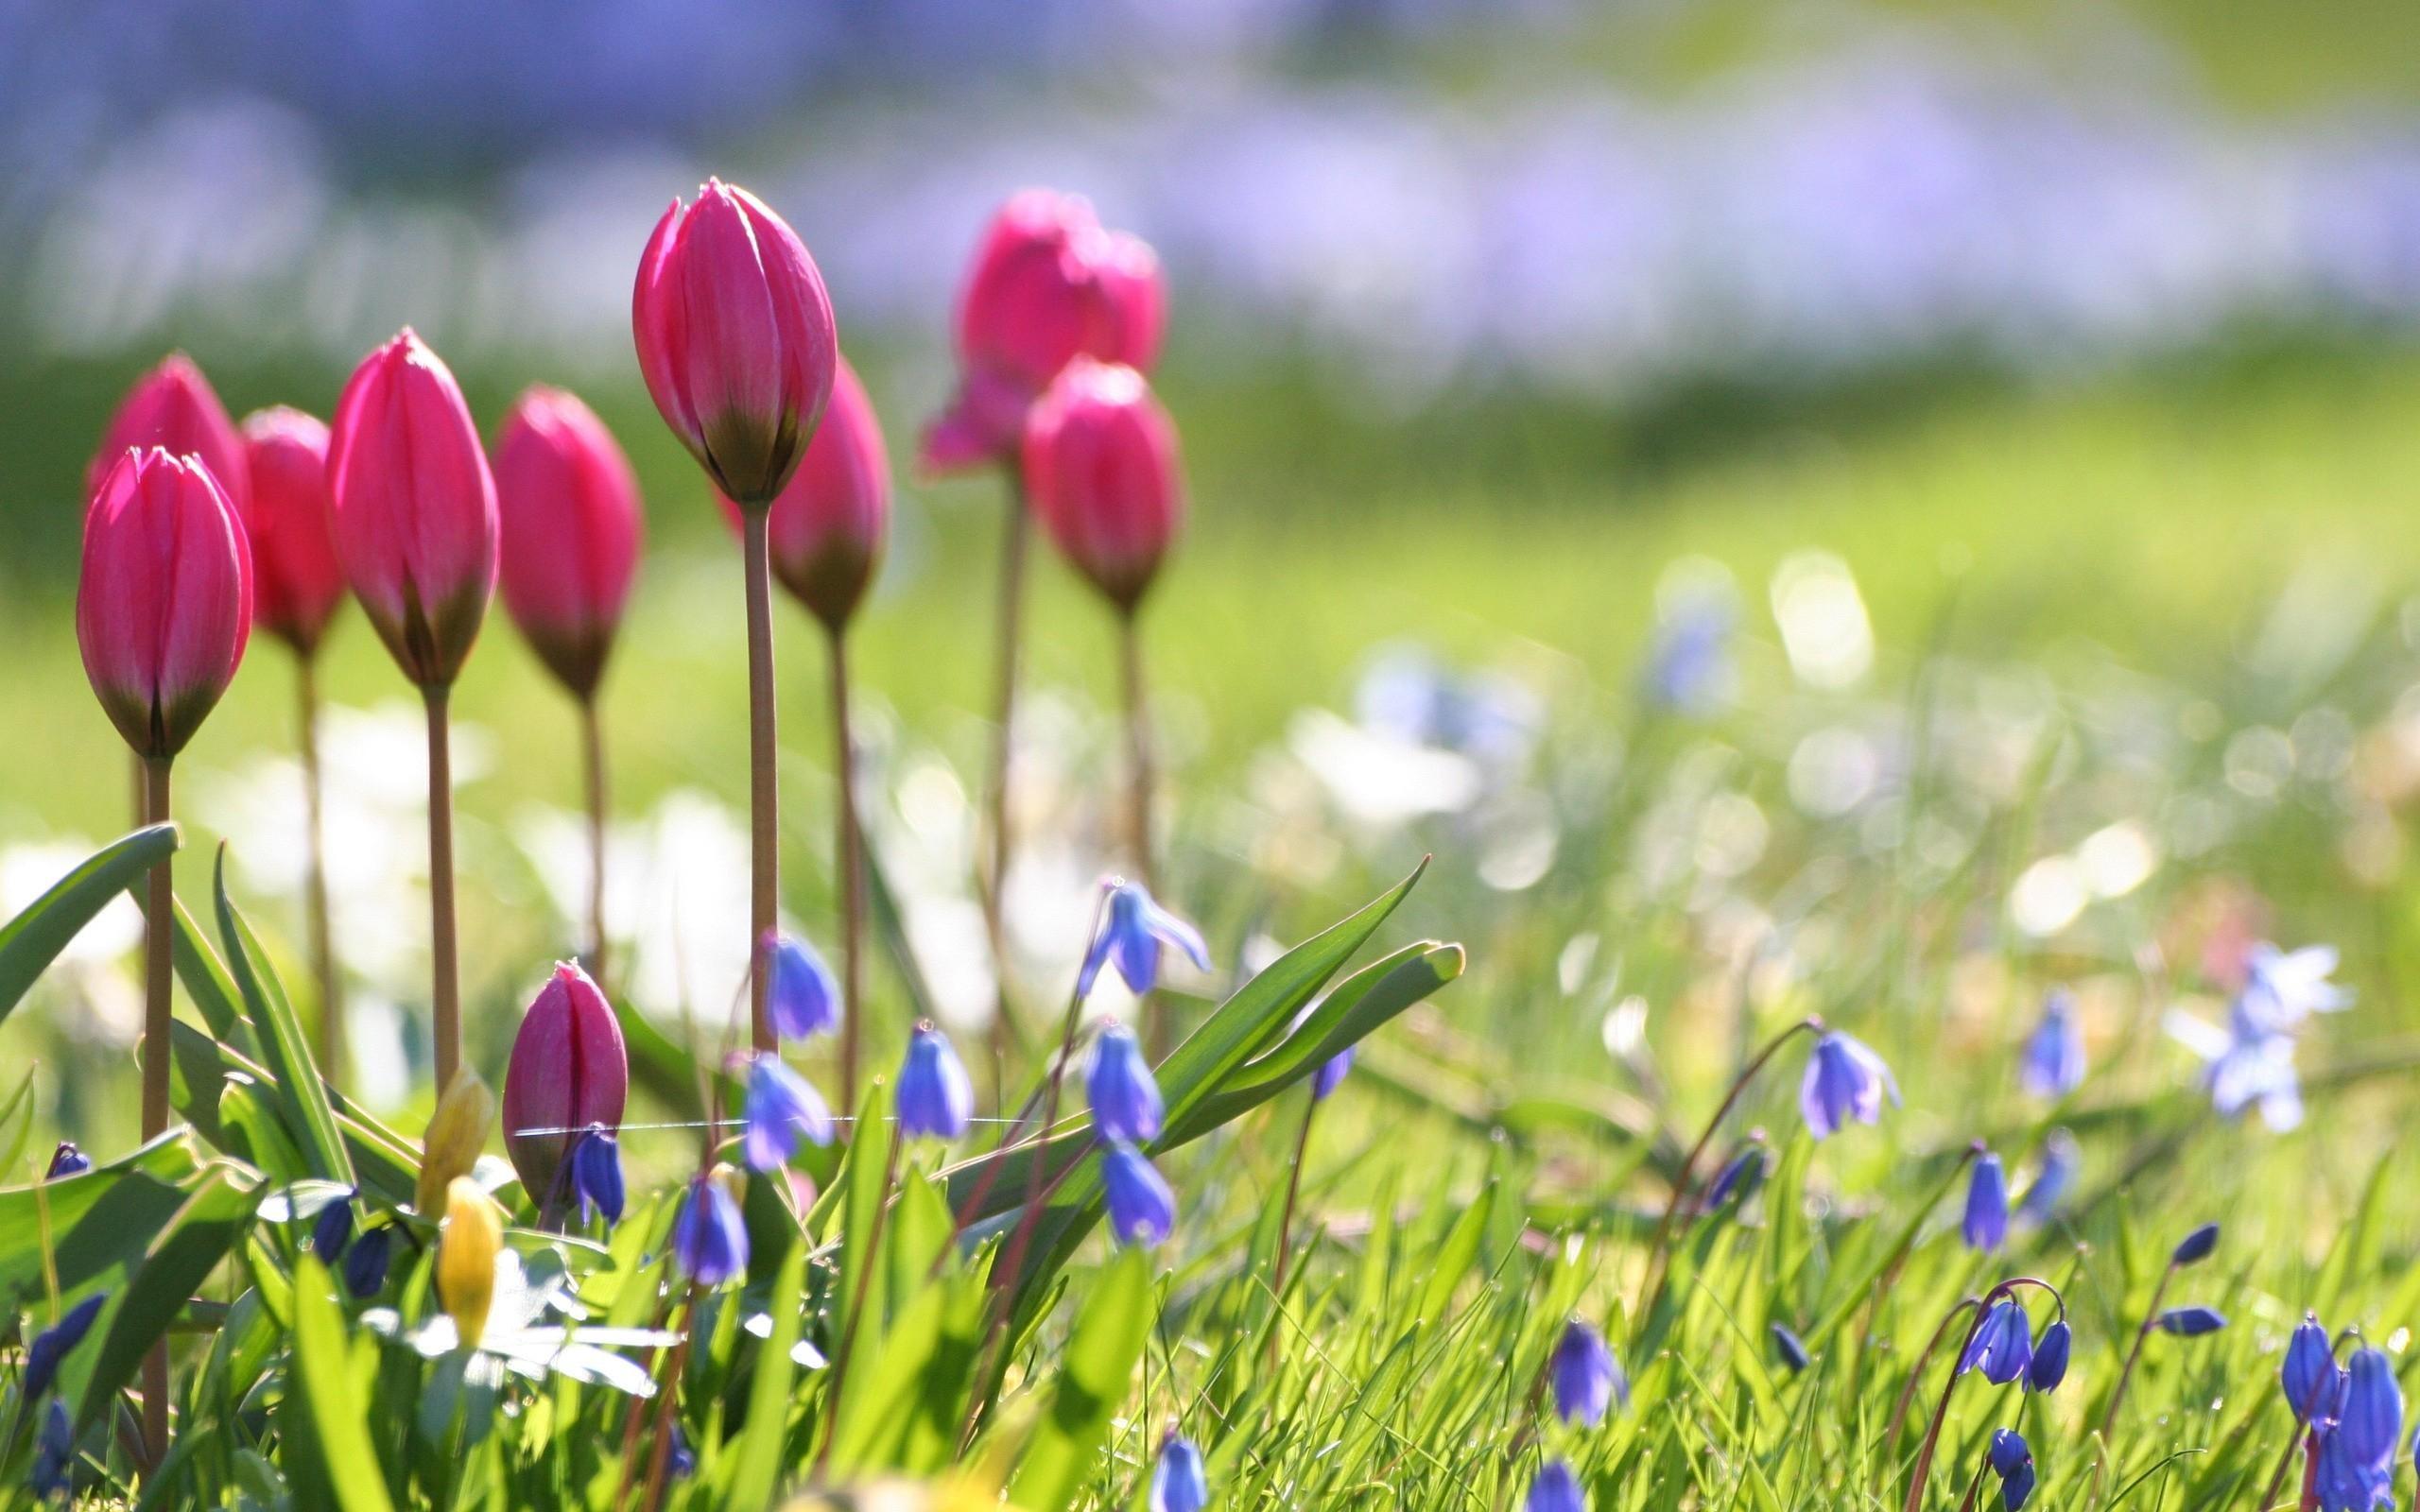 The 25+ best Spring flowers wallpaper ideas on Pinterest | Golden retriever  labrador, Puppy flowers and Cute puppy pics